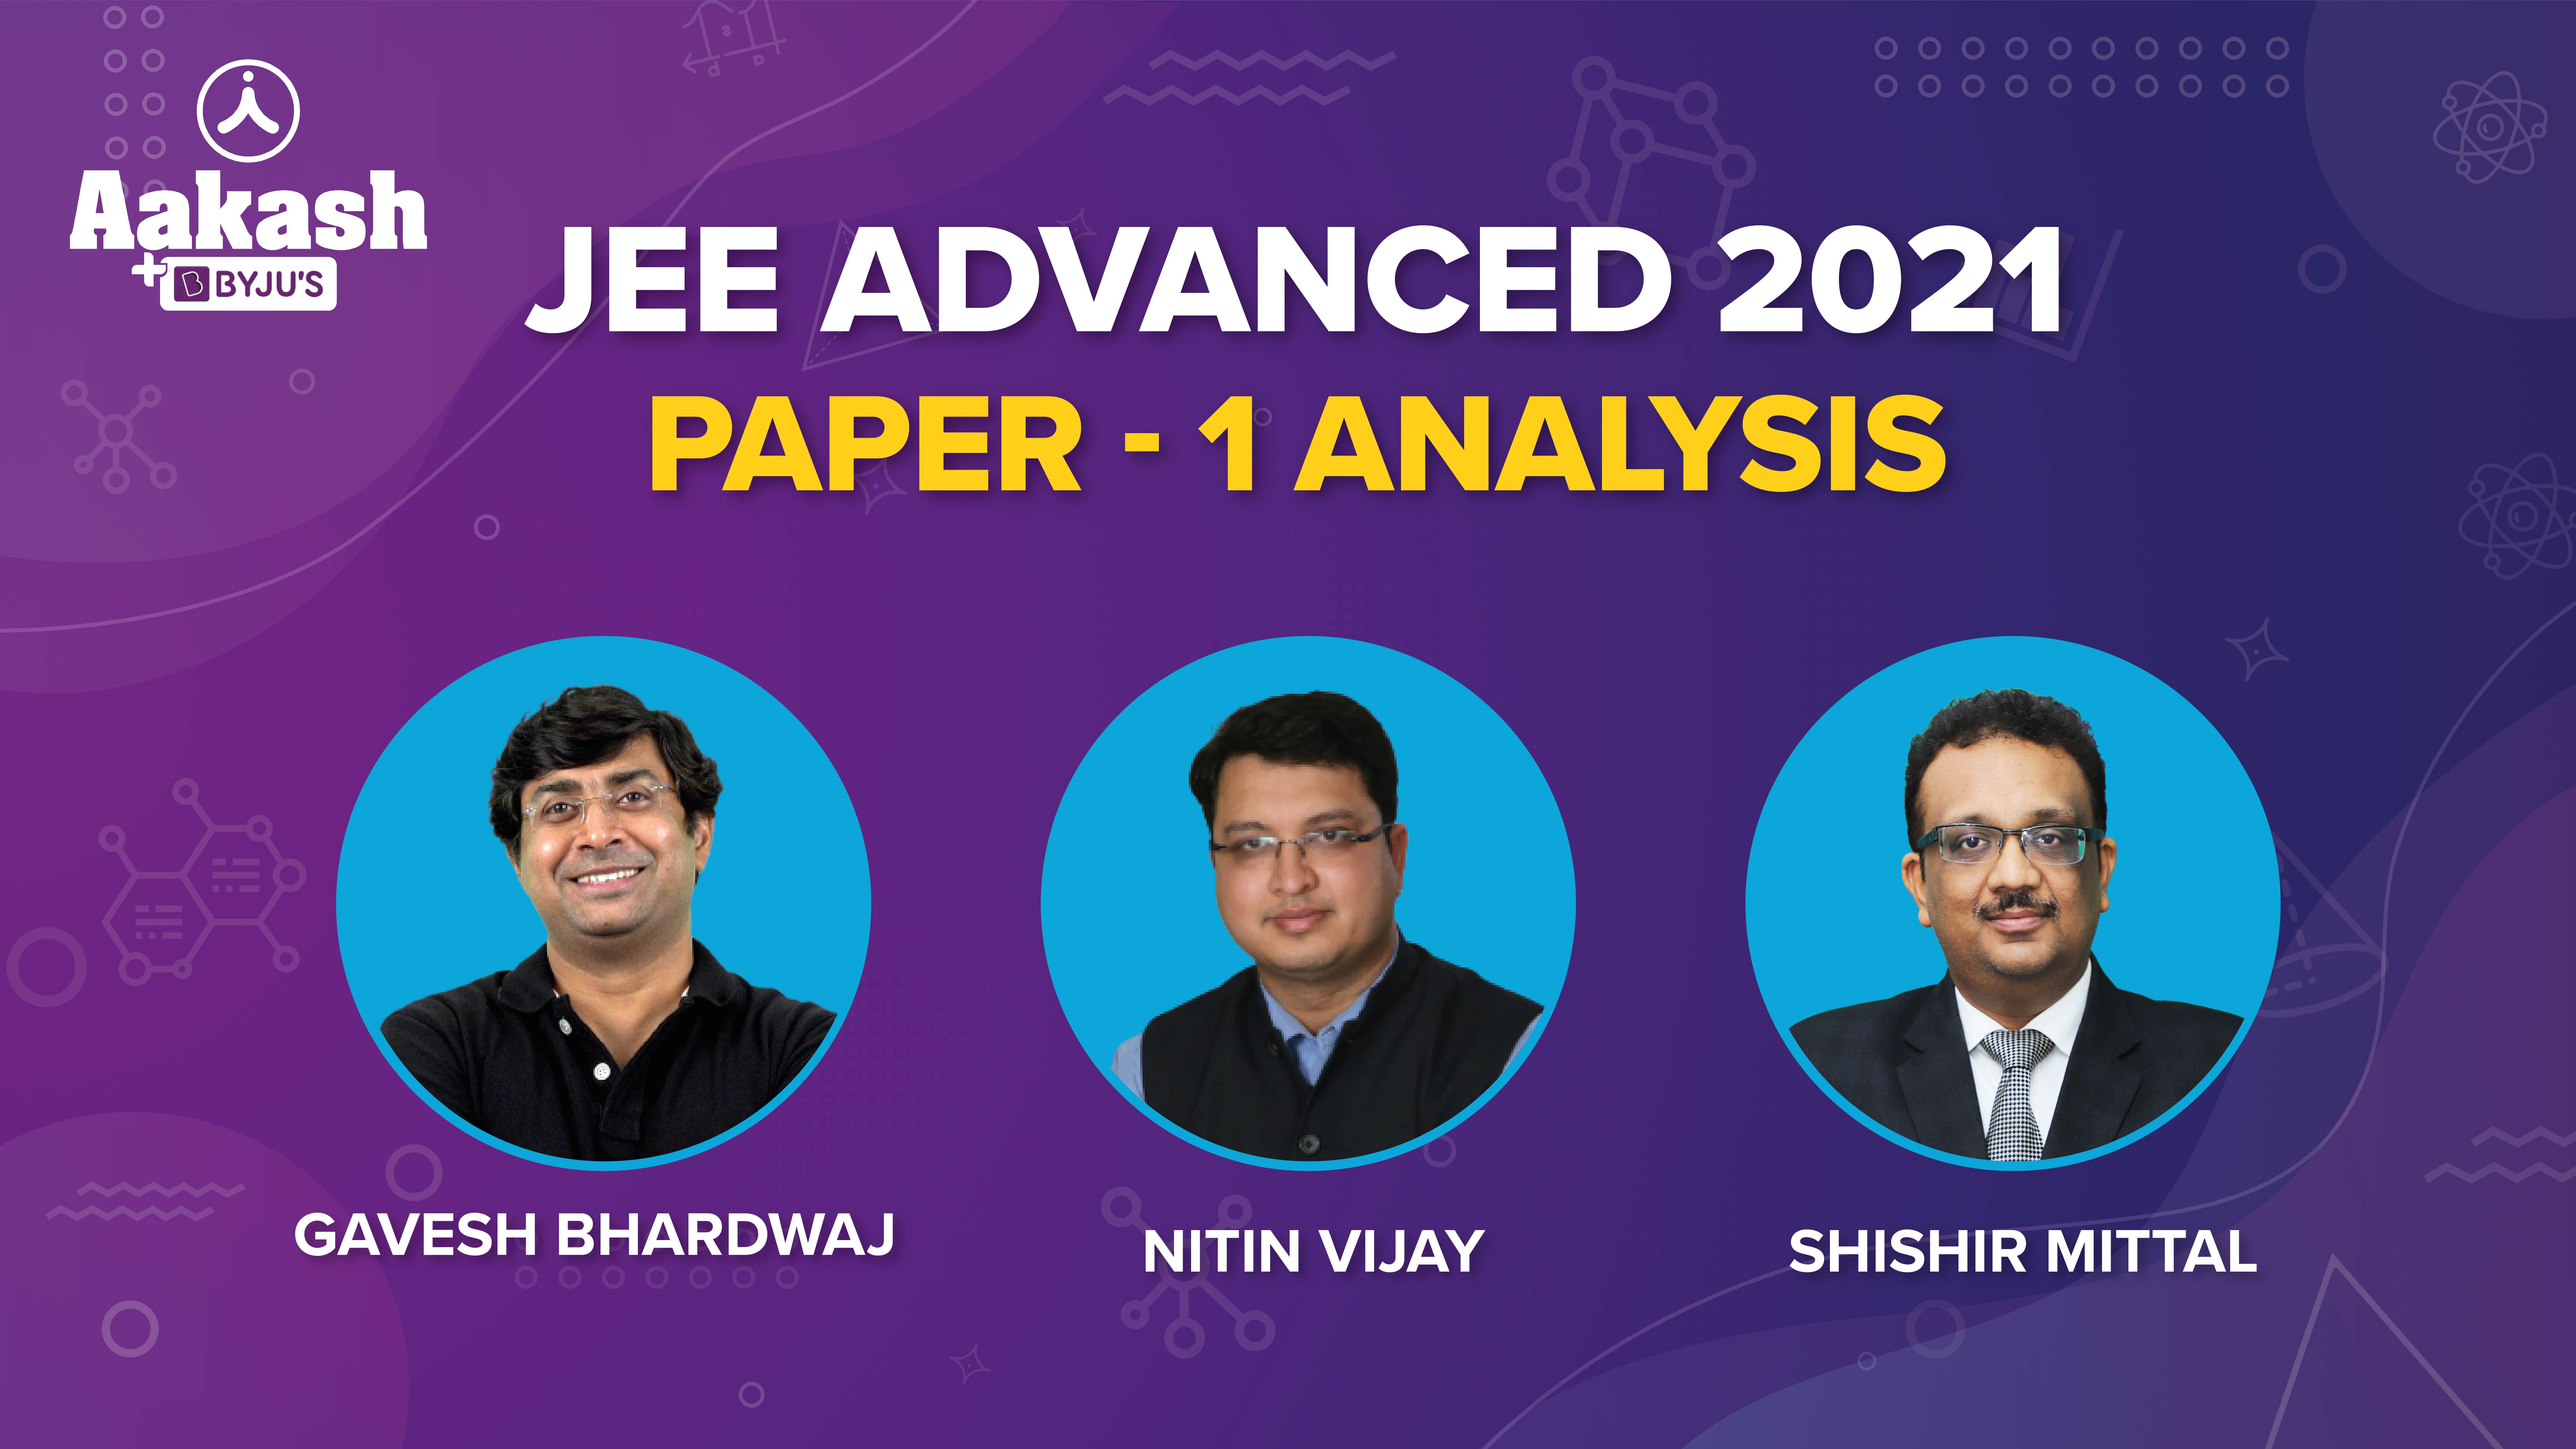 JEE Advanced 2021 Paper 1 Analysis